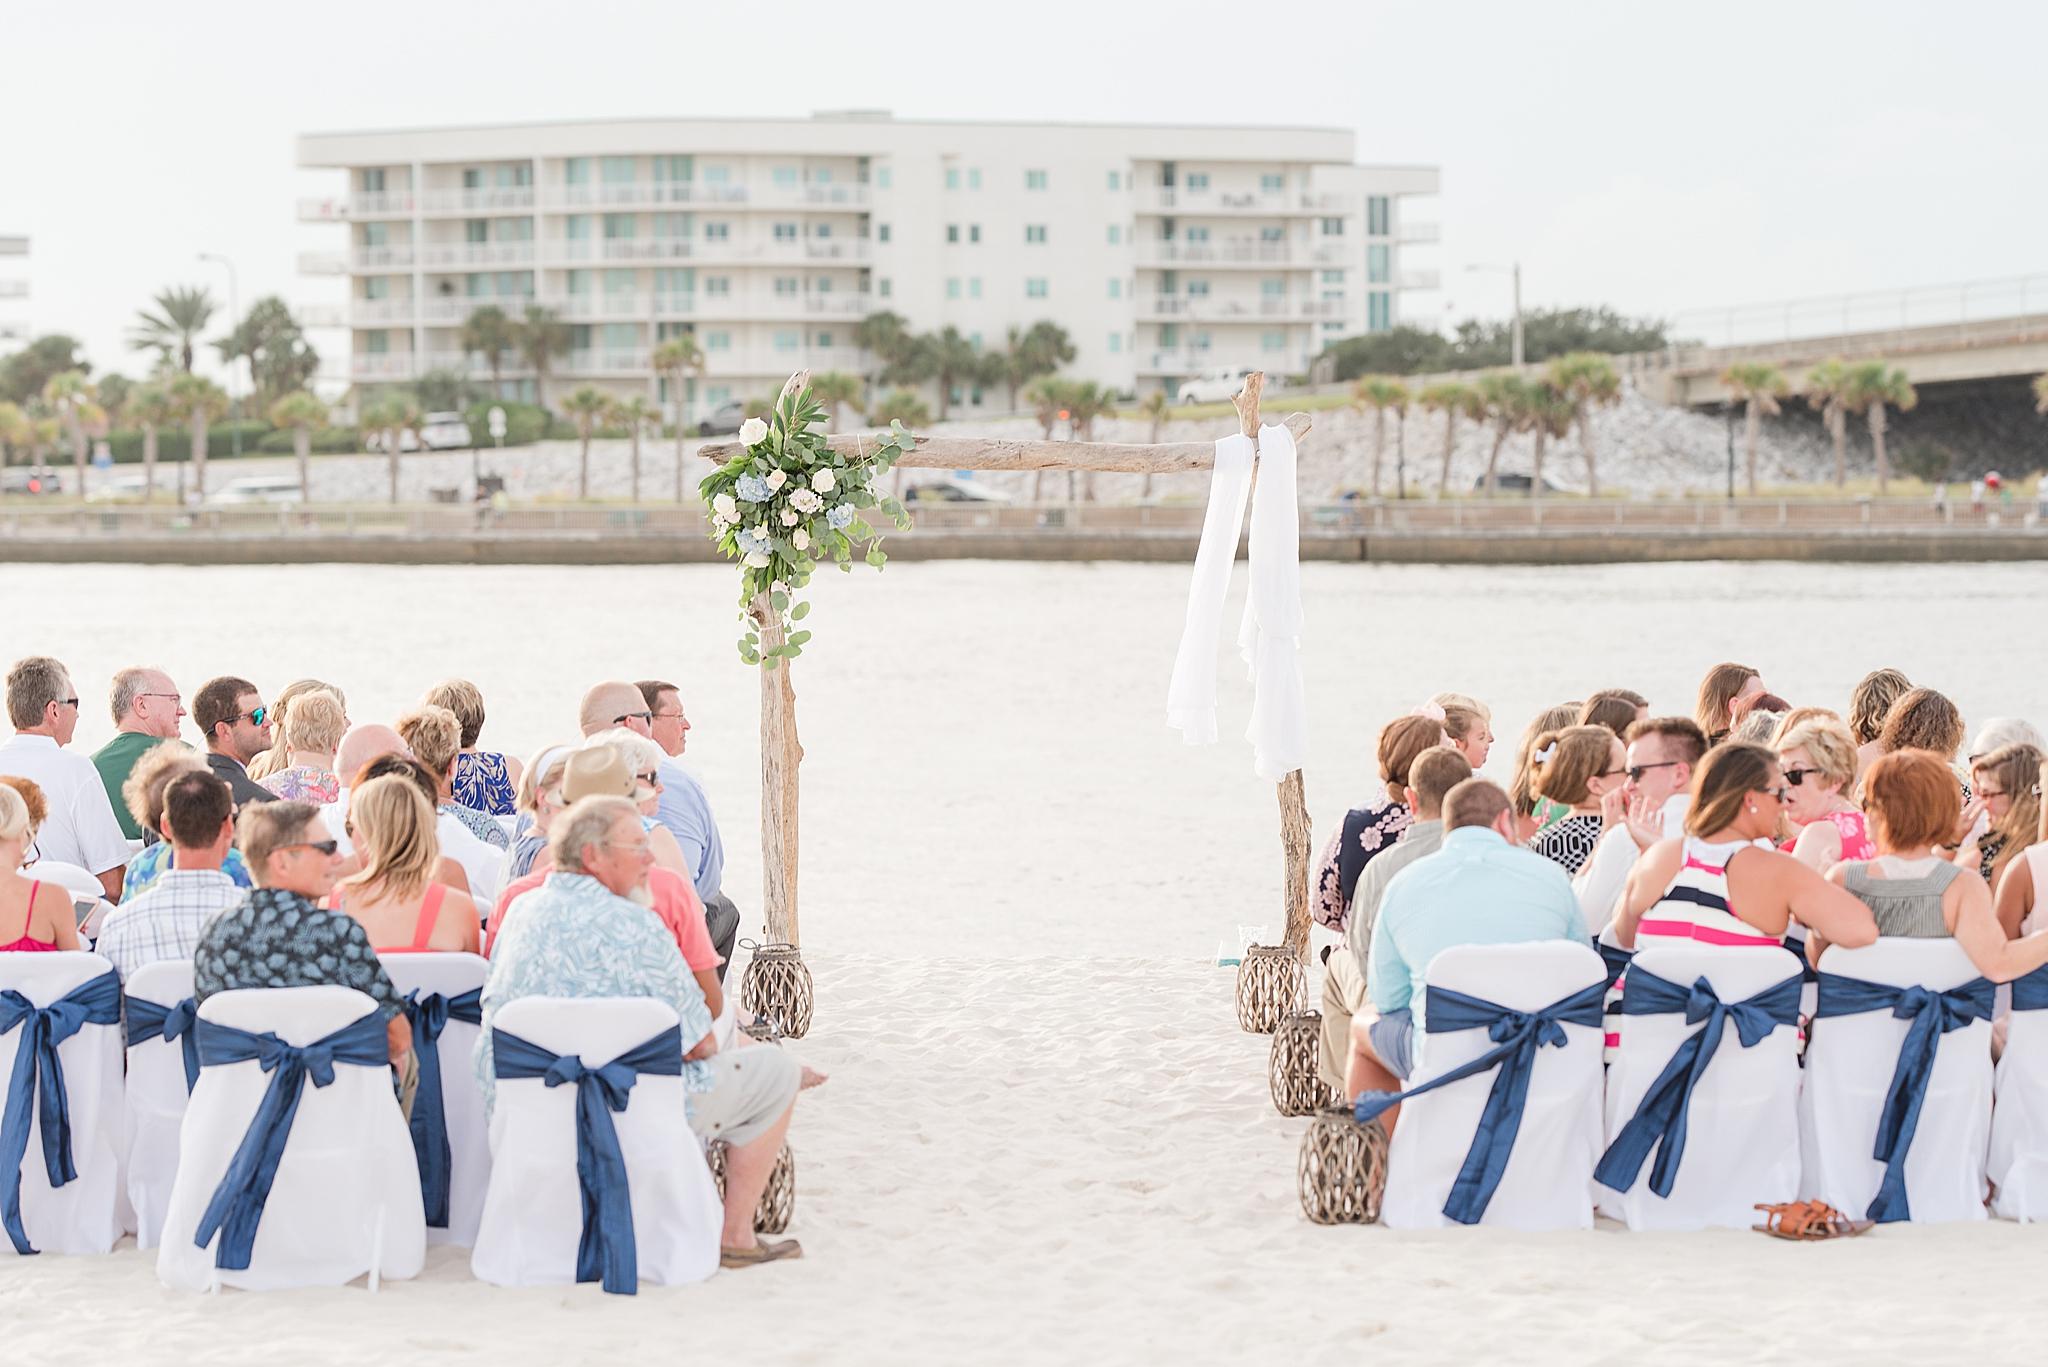 Gulf Shores Wedding Chapel wedding ceremony on the beach